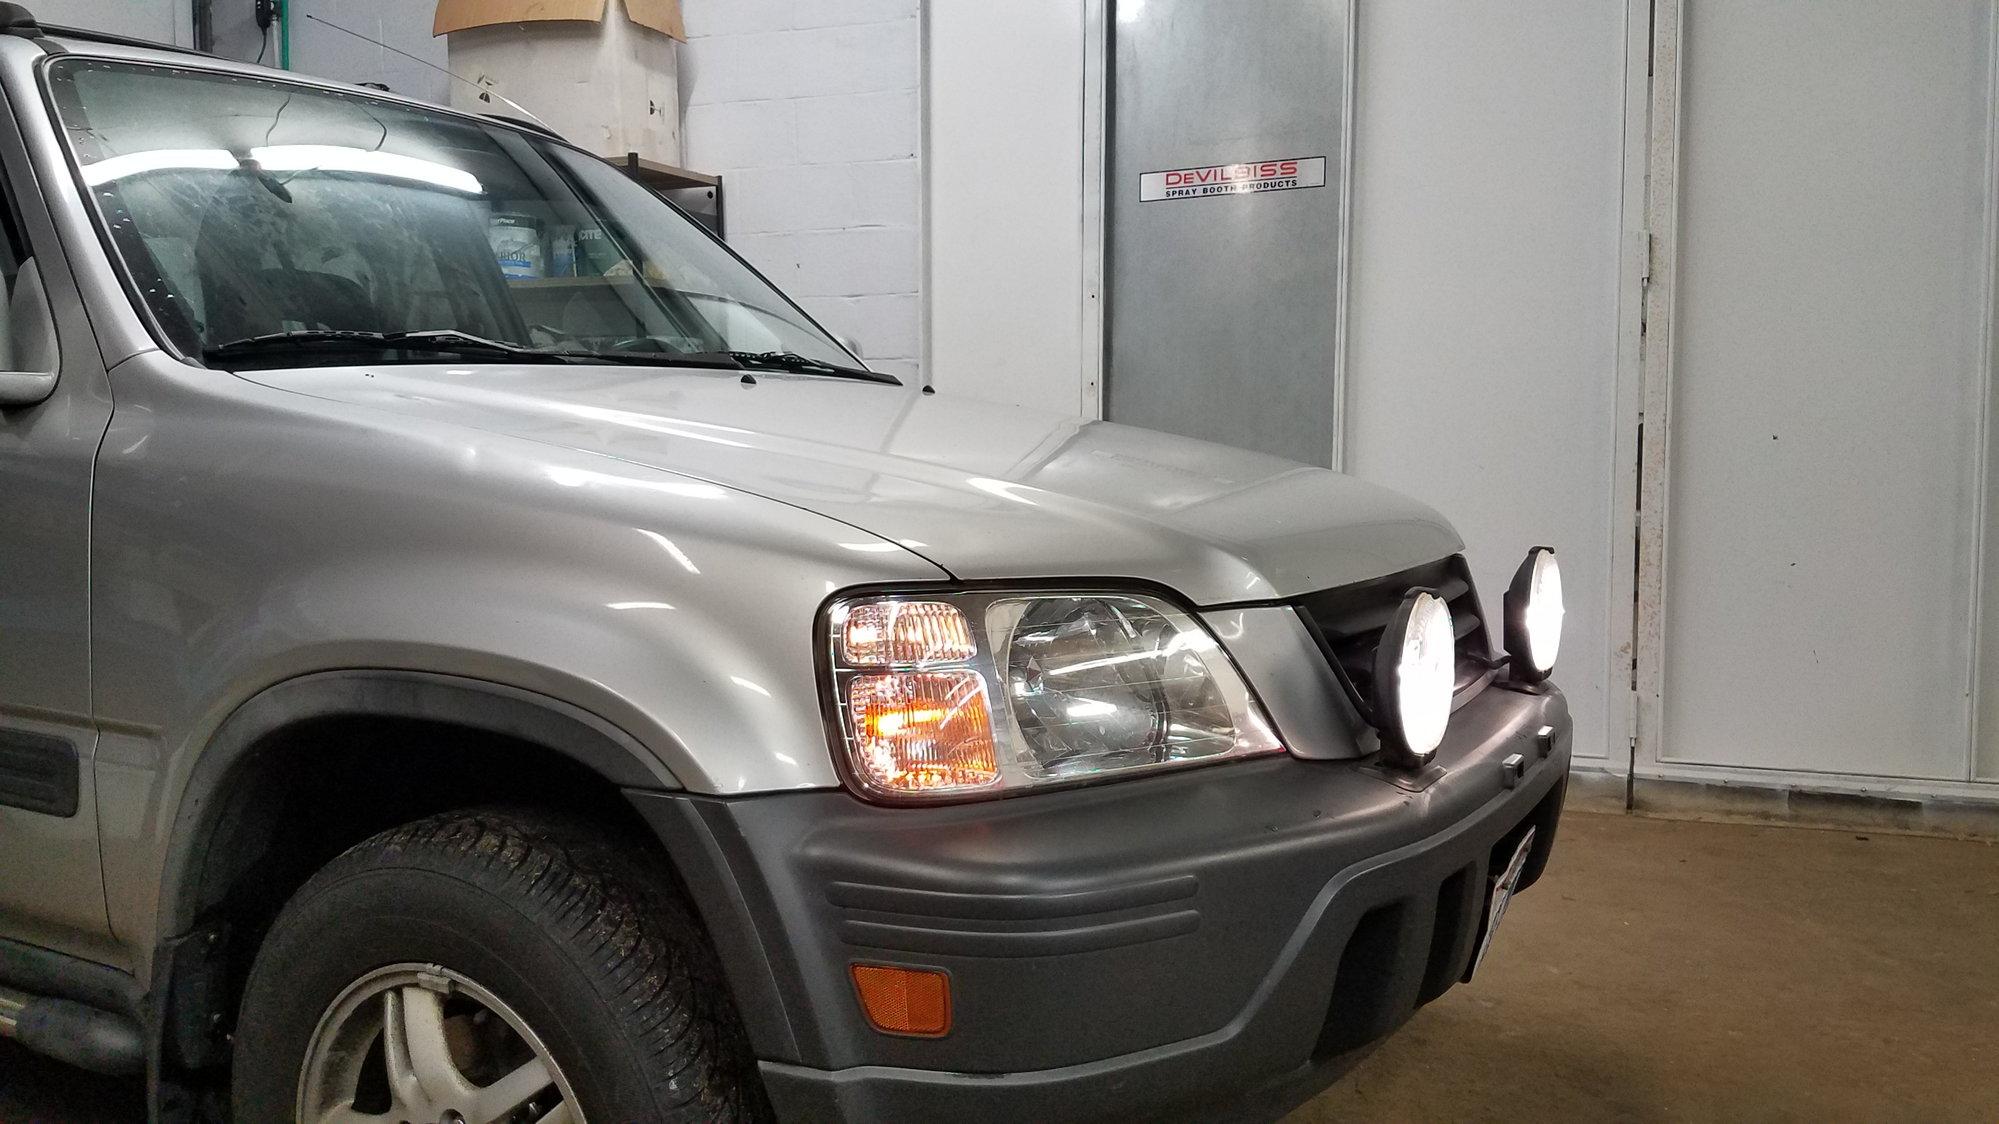 Oem Crv Foglights Not Working  No Power To Lights - Honda-tech